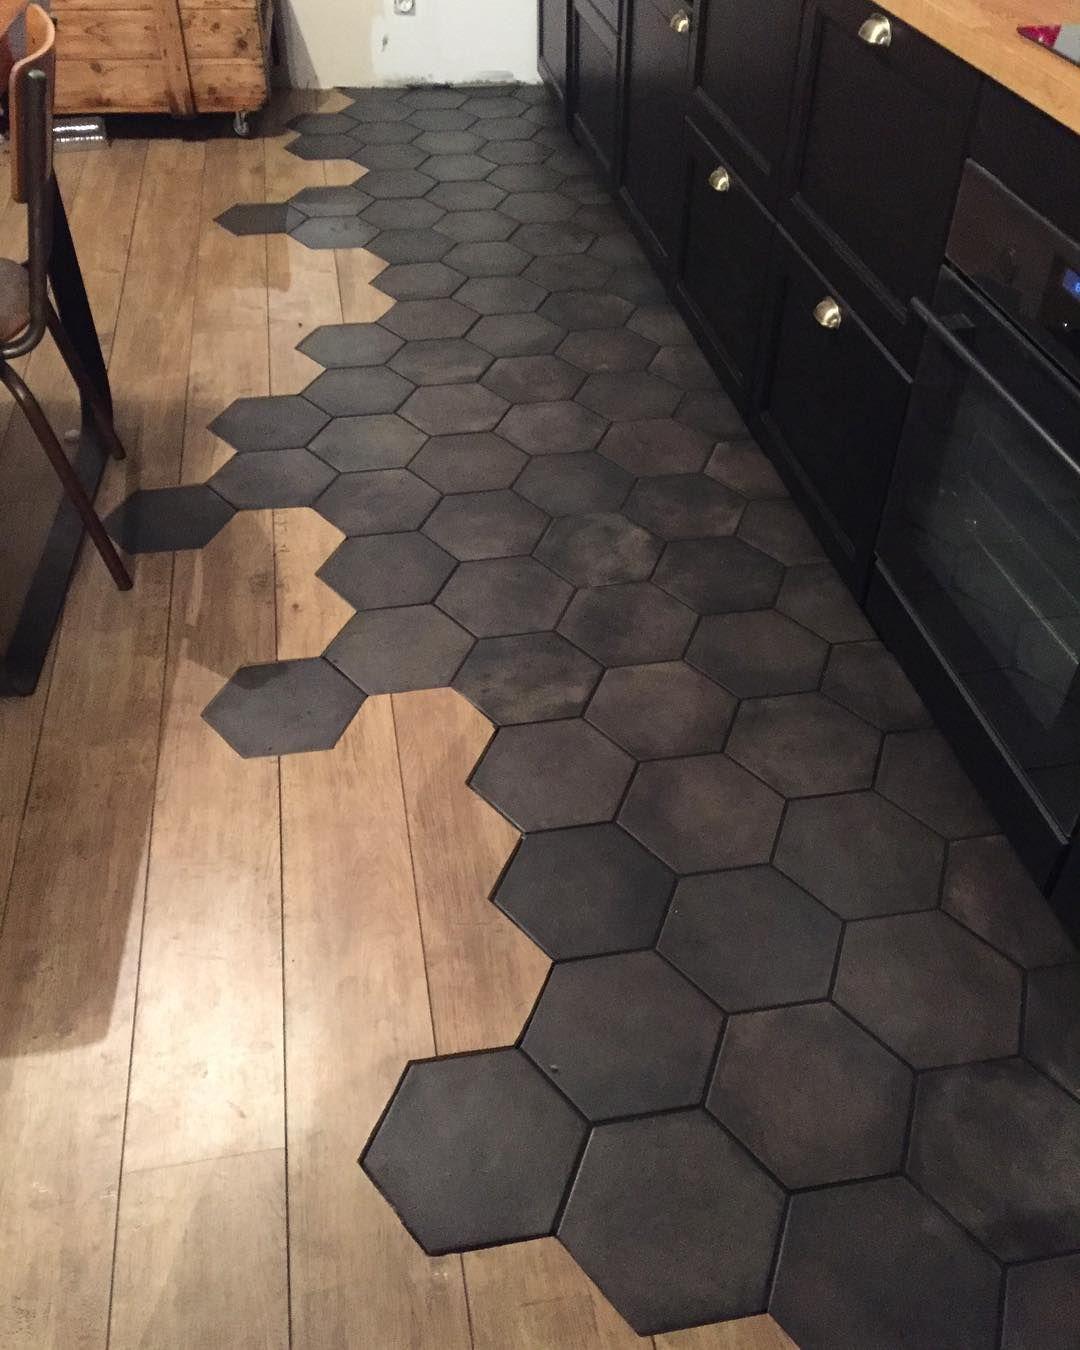 Gefallt 2 919 Mal 98 Kommentare Renovationmerfy Renovation Merfy Auf Instagram Les Joints De Carrelage Cuisine Sol Deco Maison Interieur Idee Carrelage